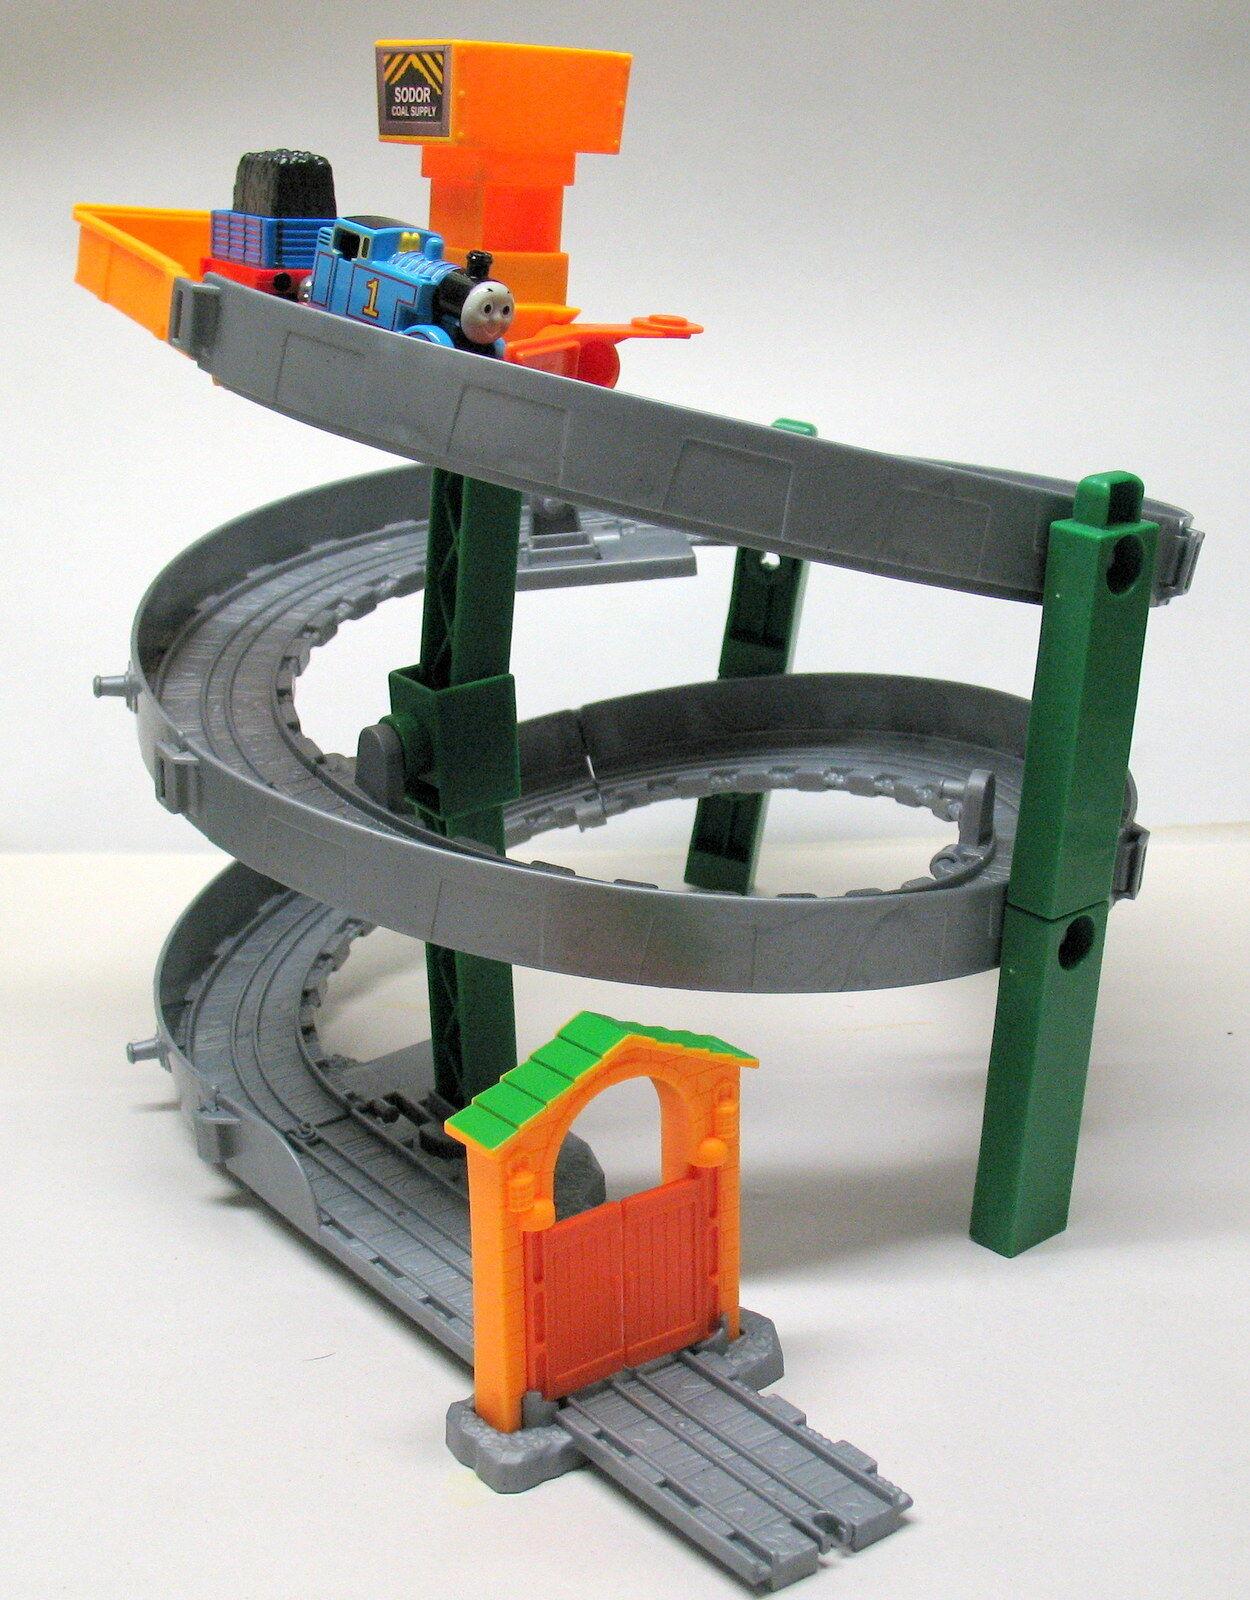 Take Take Take N Play Thomas, Sodor Coal Supply with Spiral Railway, Mattel 2012, EUC 6f5bf3